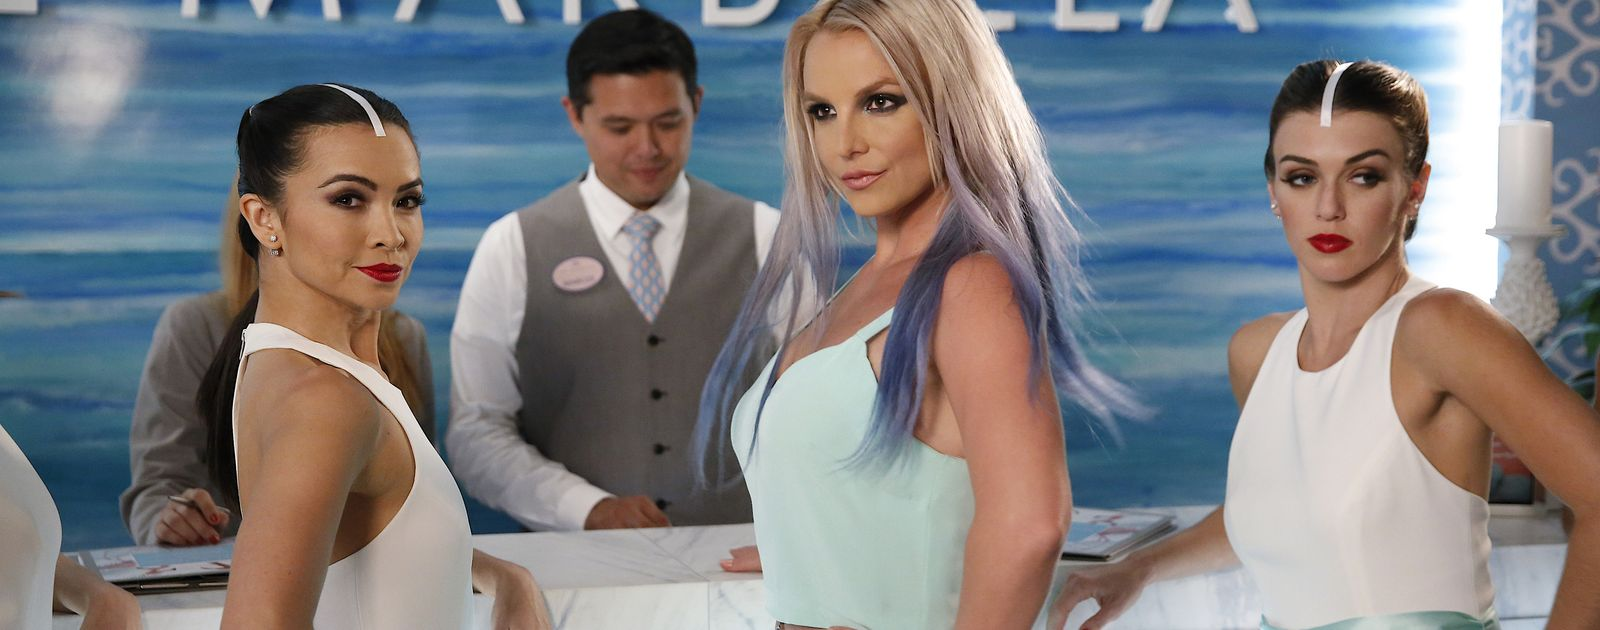 635824224160958496-Britney-Spears-Jane-the-Virgin